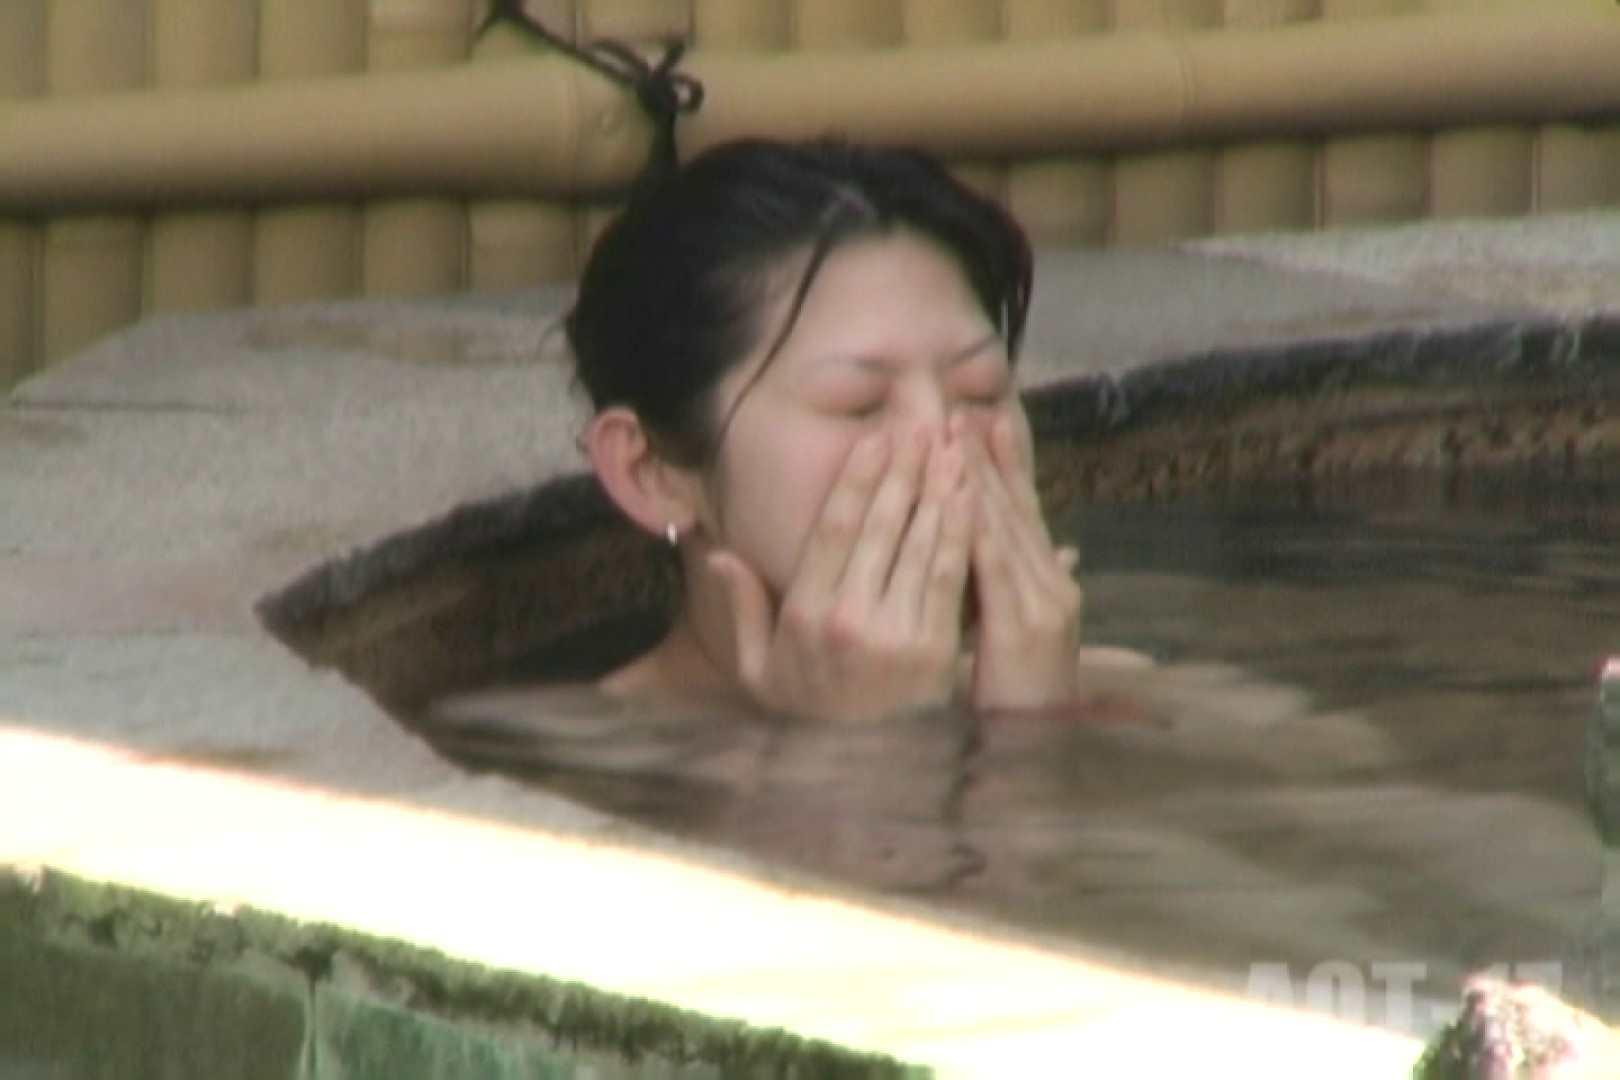 Aquaな露天風呂Vol.850 露天風呂突入 | 盗撮師作品  73pic 64